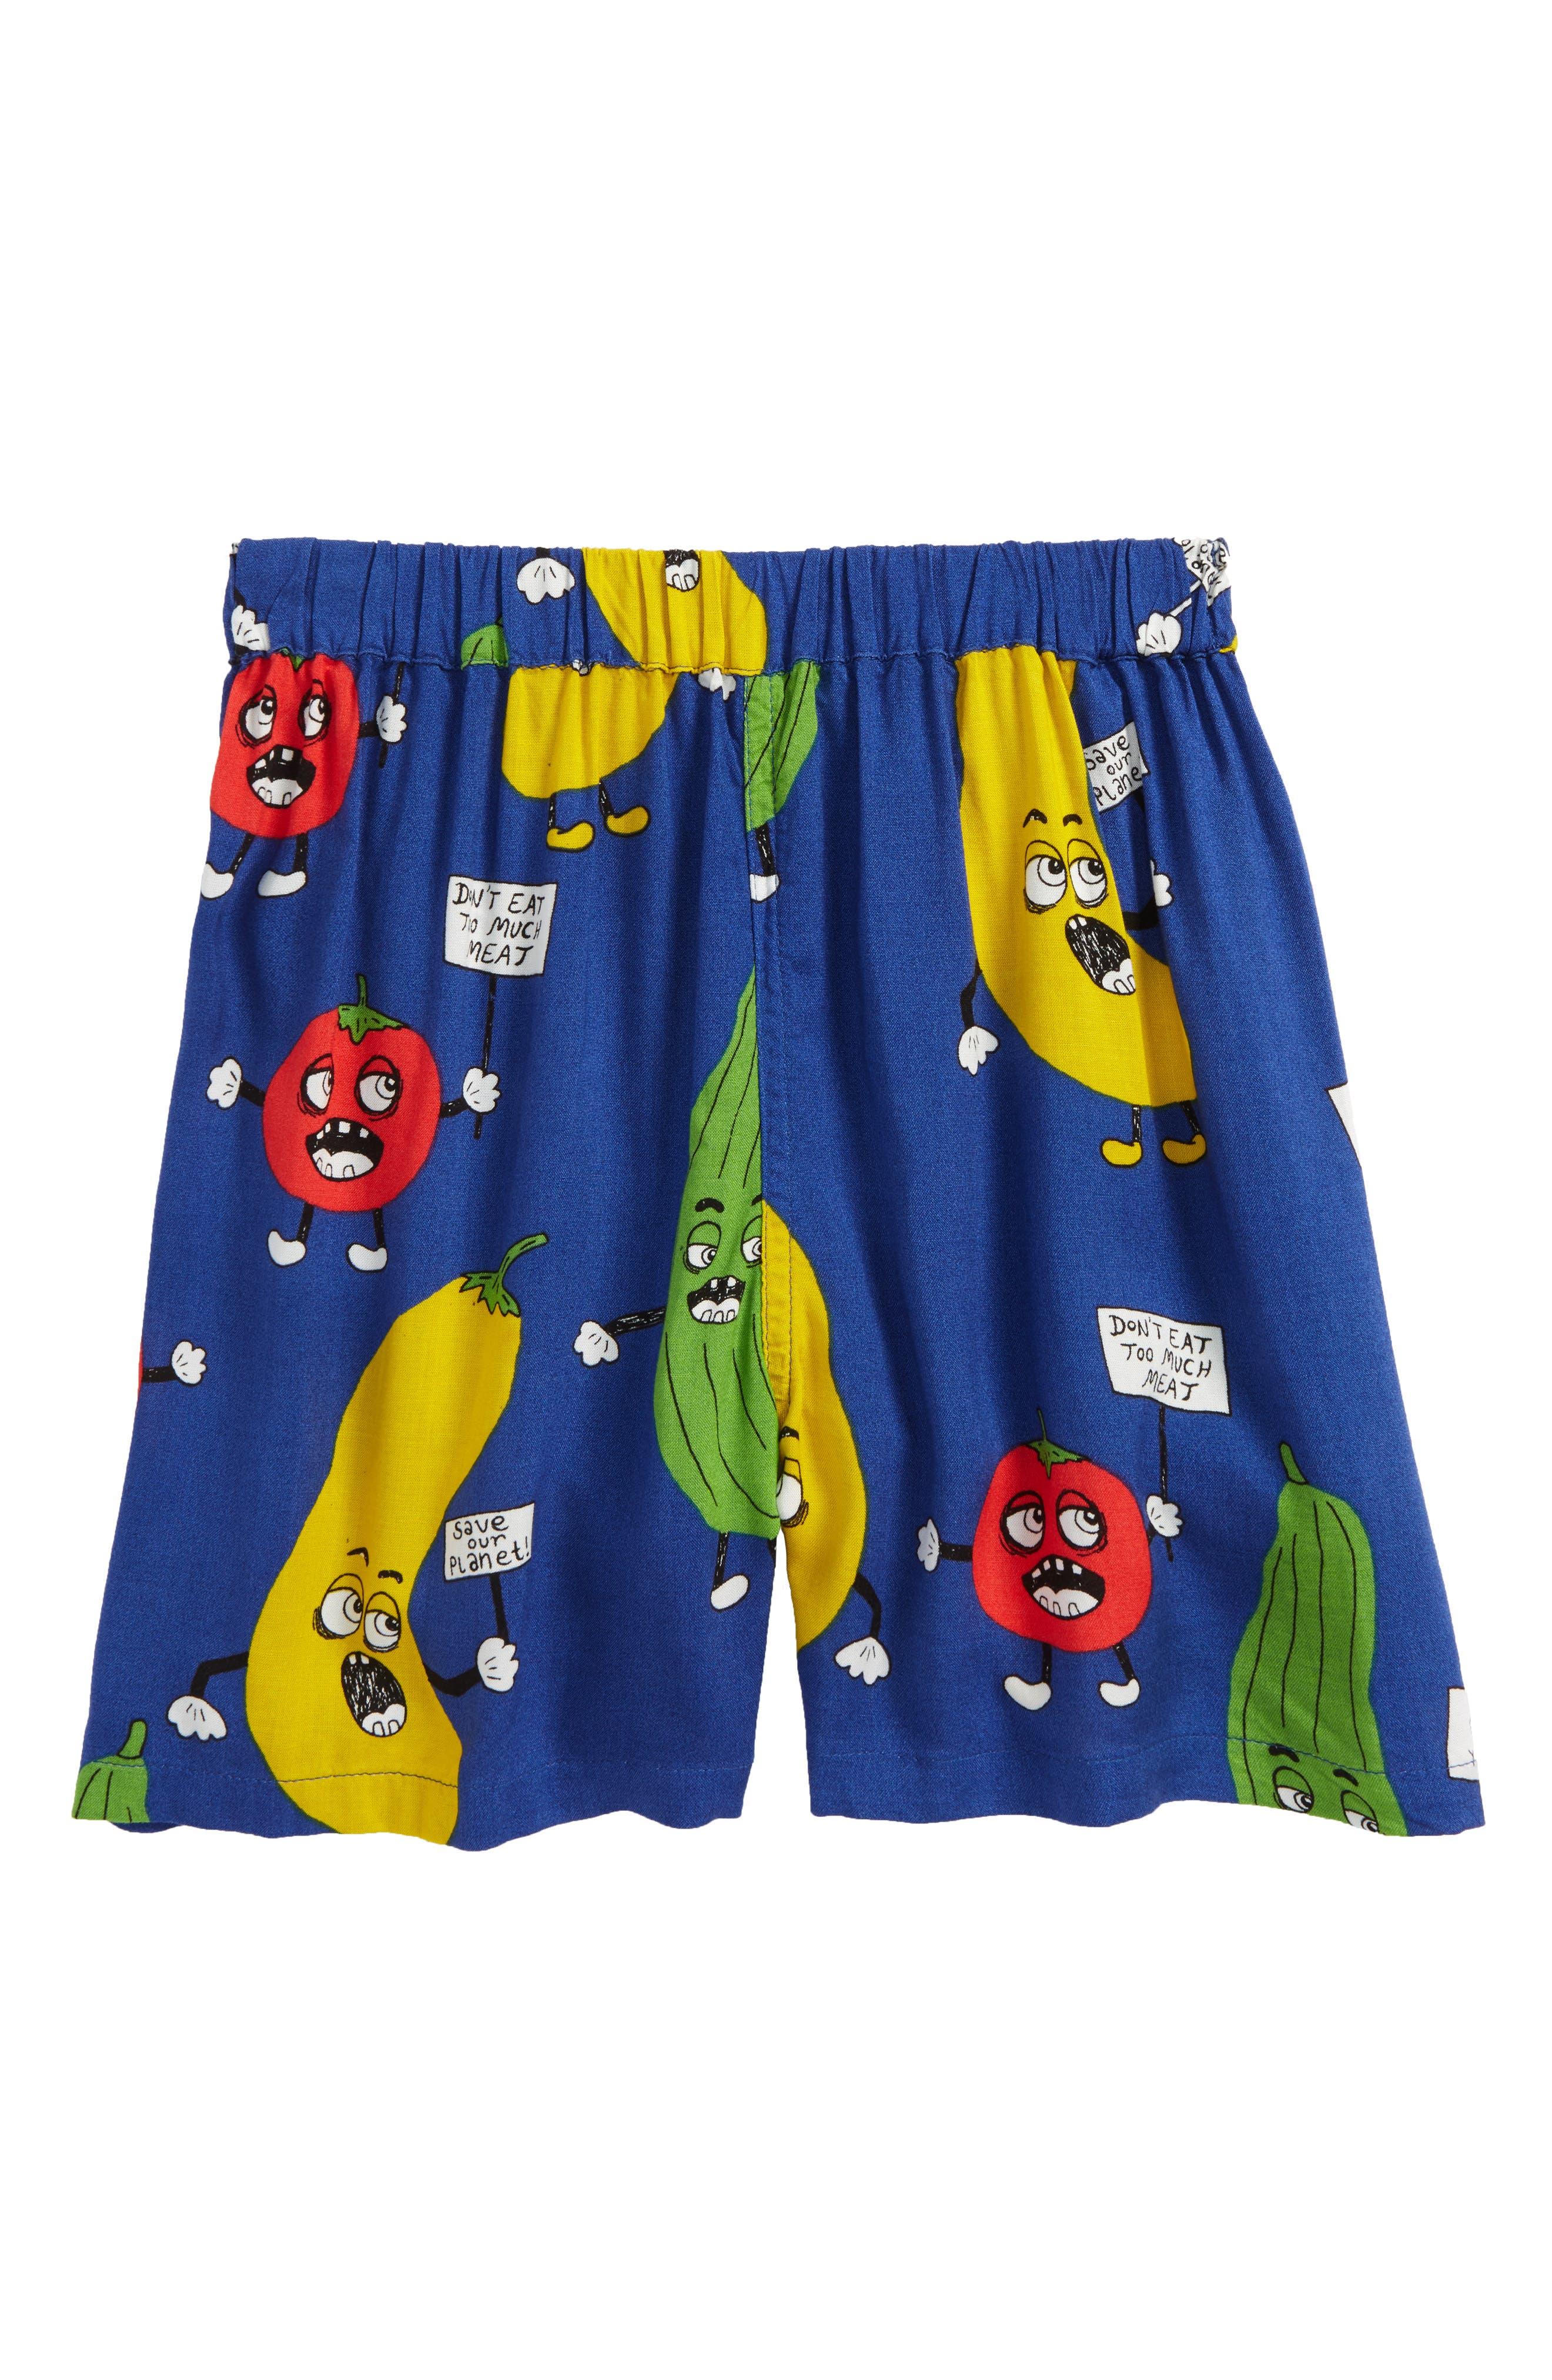 Veggie Woven Shorts,                             Main thumbnail 1, color,                             400